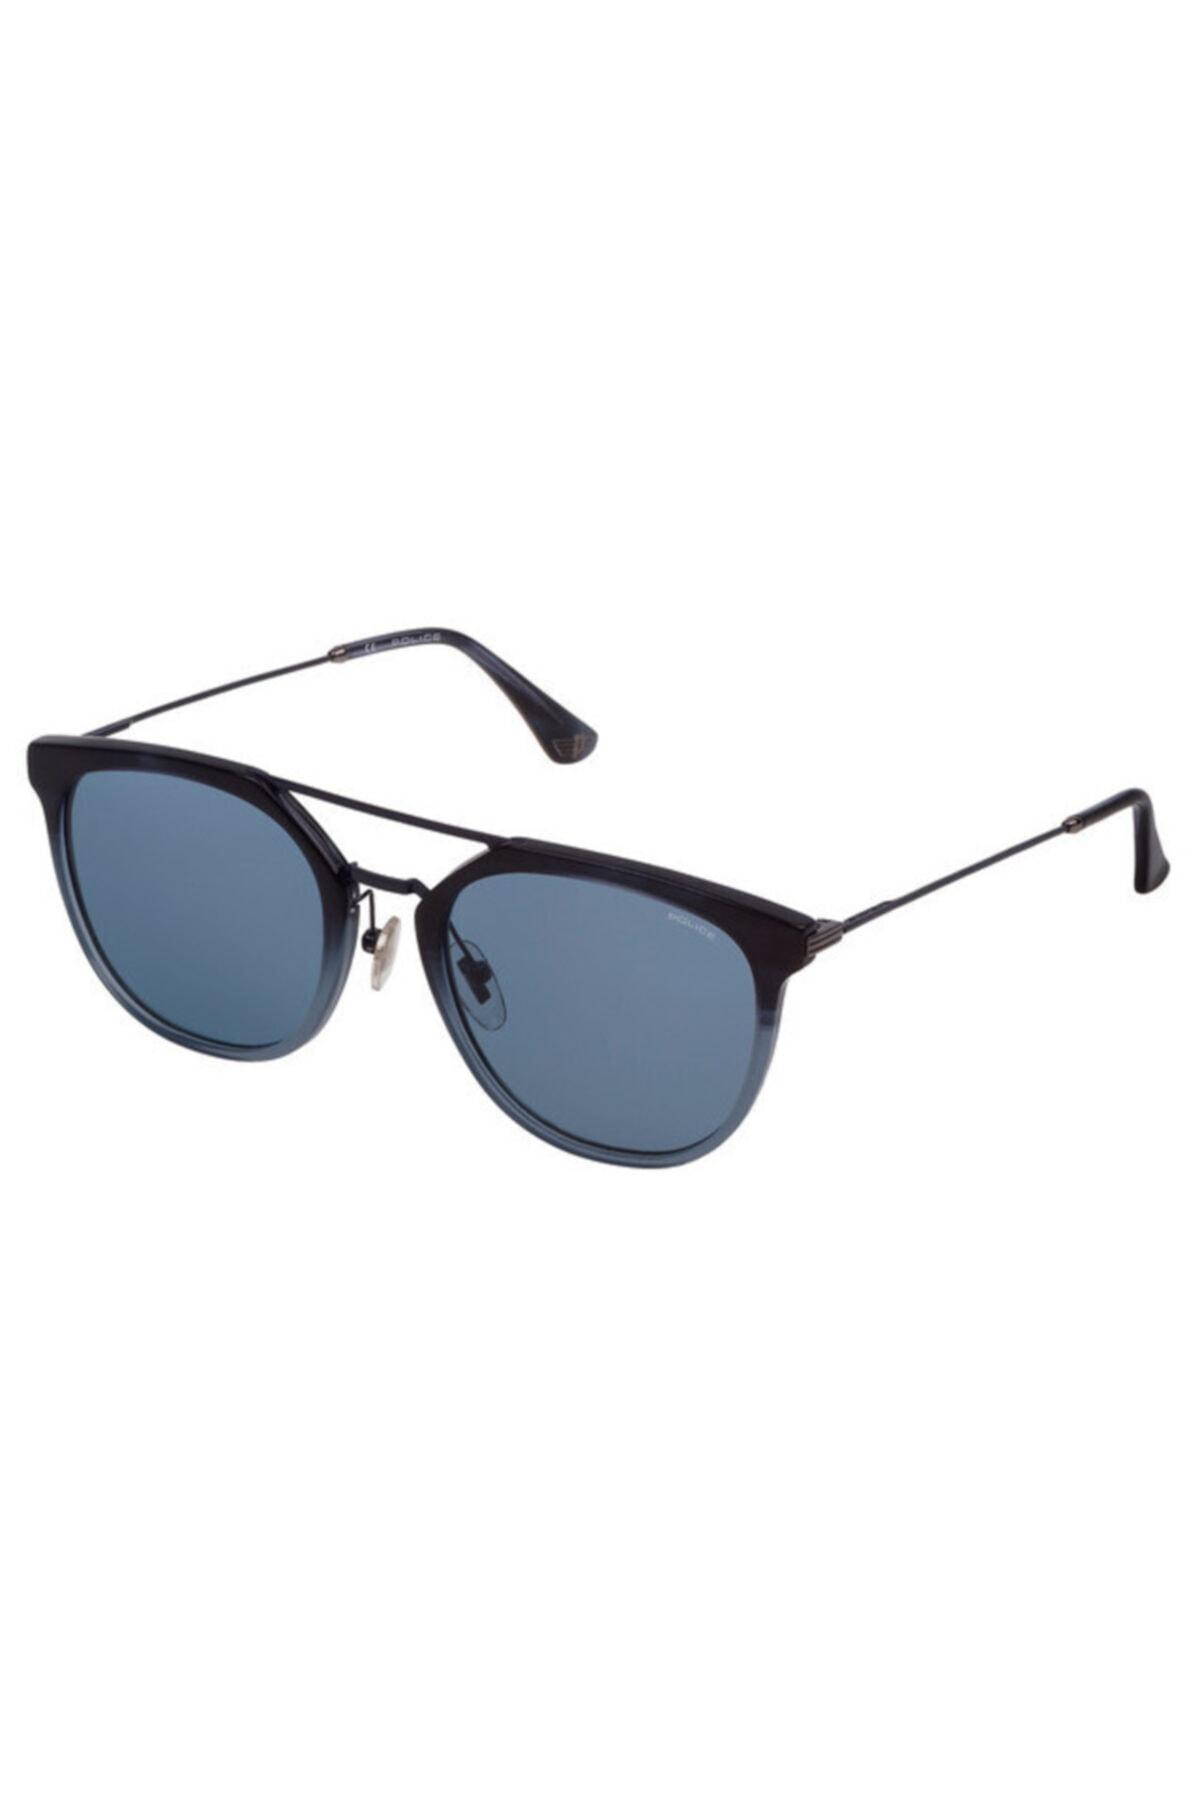 فروش عینک آفتابی زنانه 2020 برند Police رنگ لاجوردی کد ty40749391